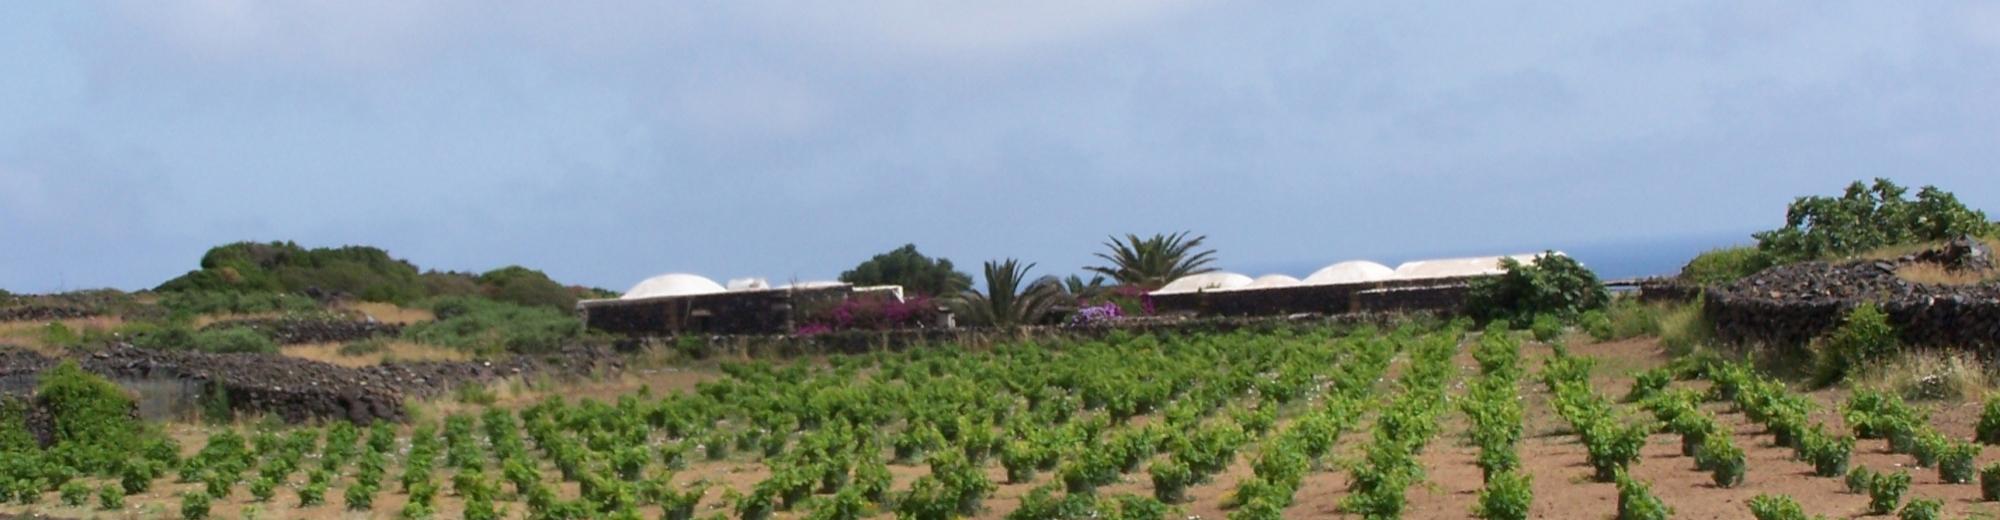 Azienda vitivinicola di Pantelleria